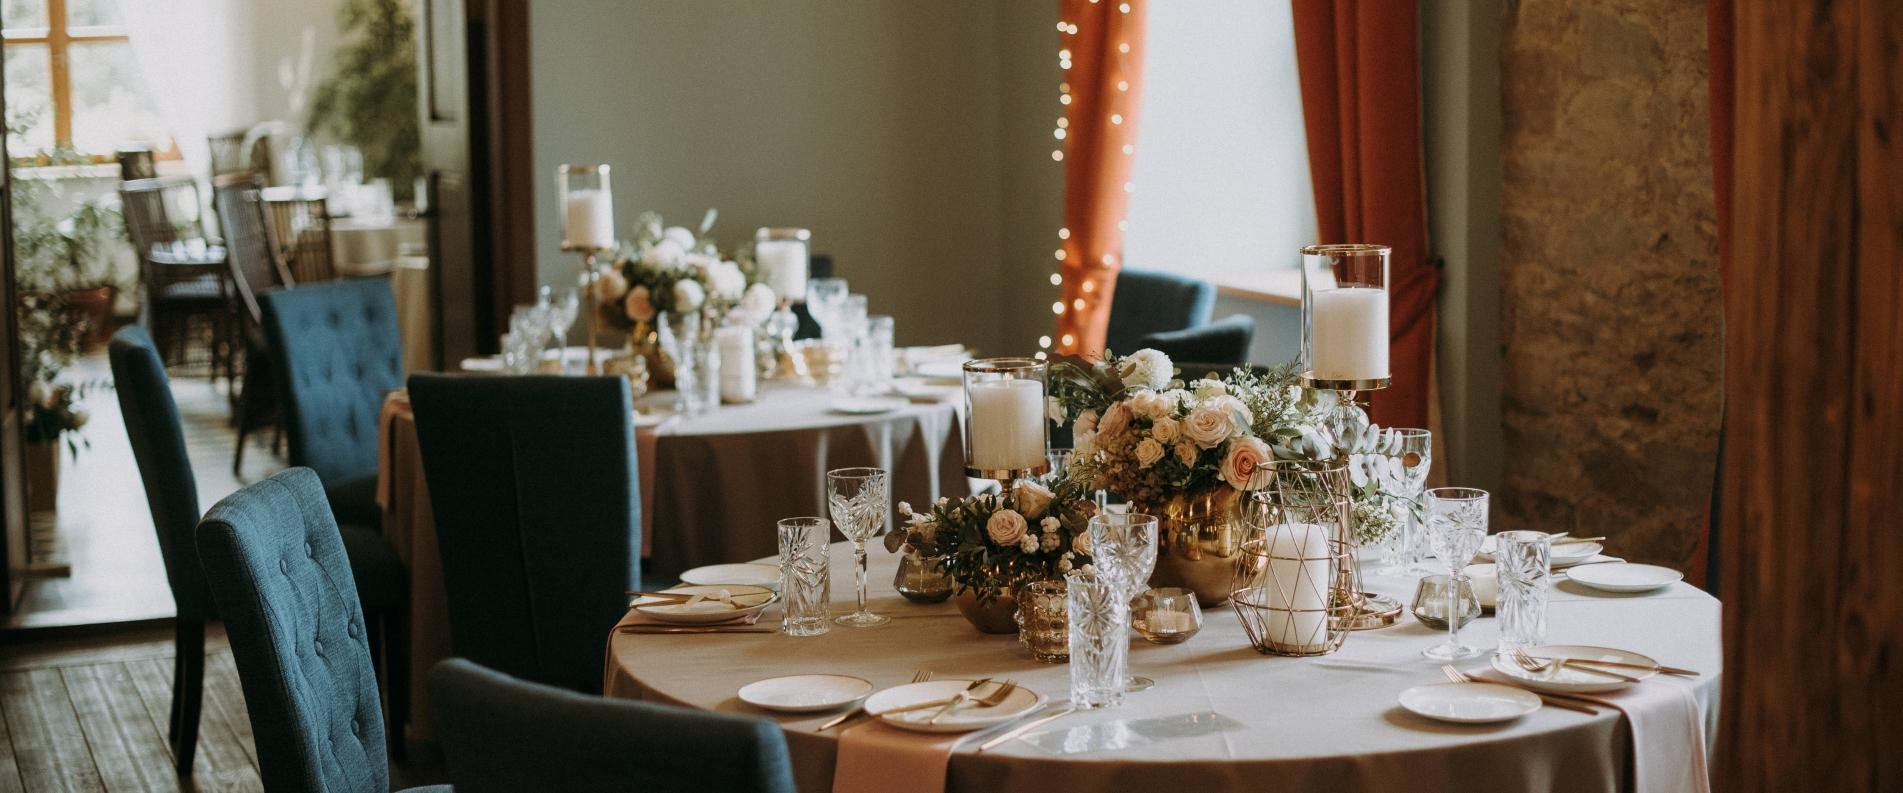 dace-haralds-by-miks-sels-weddings-442_9950-06632ff6974ddbe42b2d9cb157097a1a.jpg